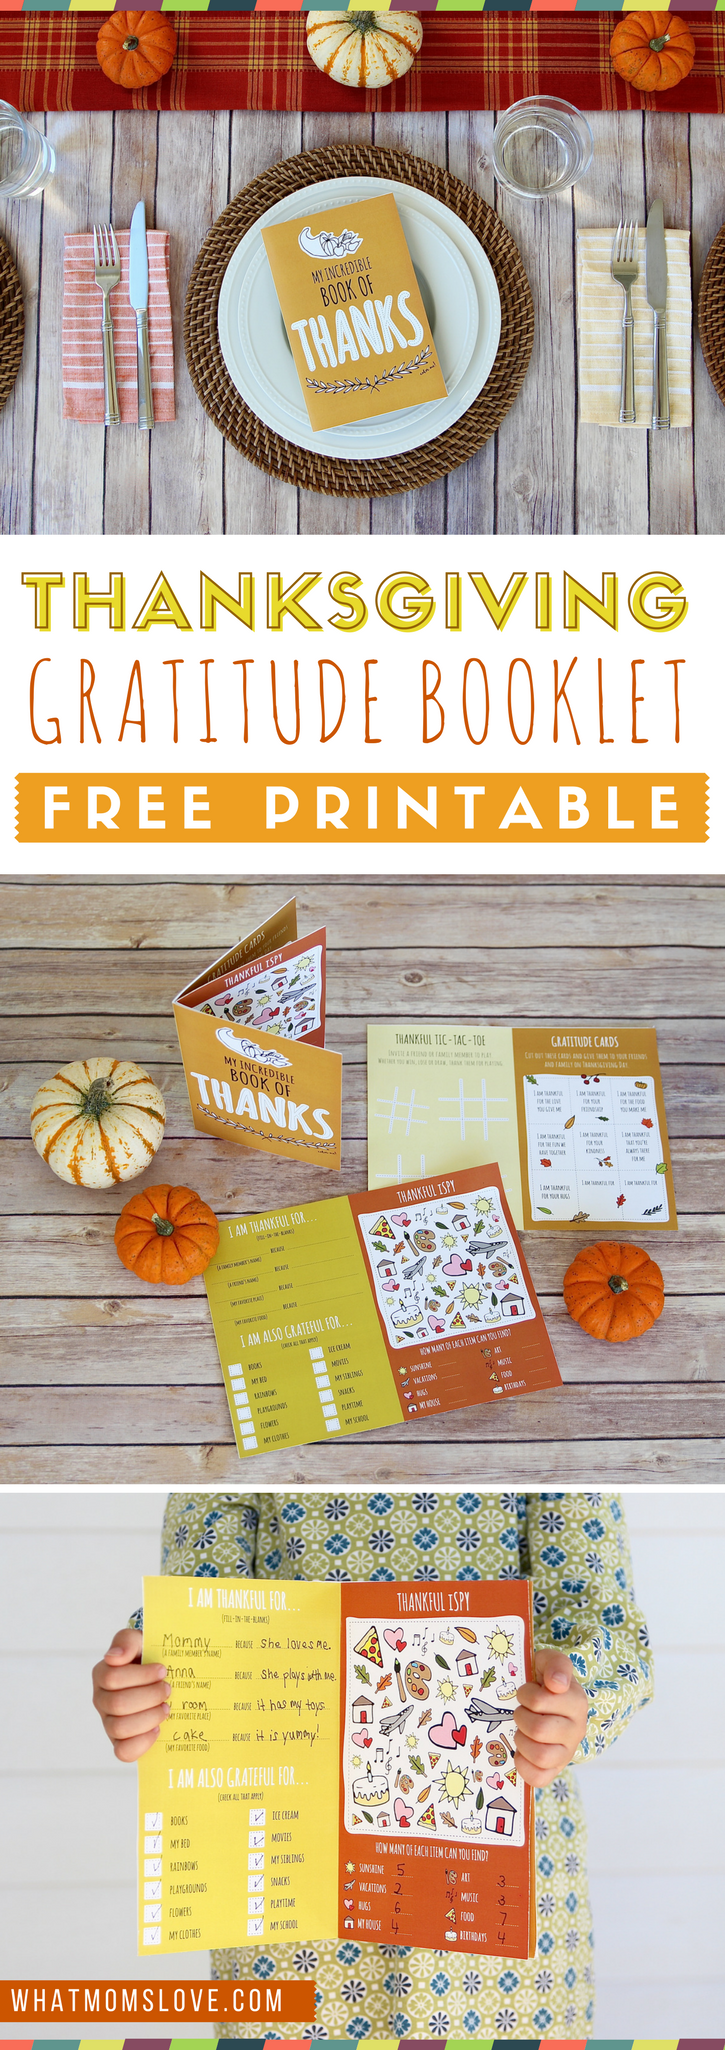 Free Printable Thanksgiving Gratitude Booklet Thanksgiving Activities For Kids Thanksgiving Kids Thanksgiving Fun